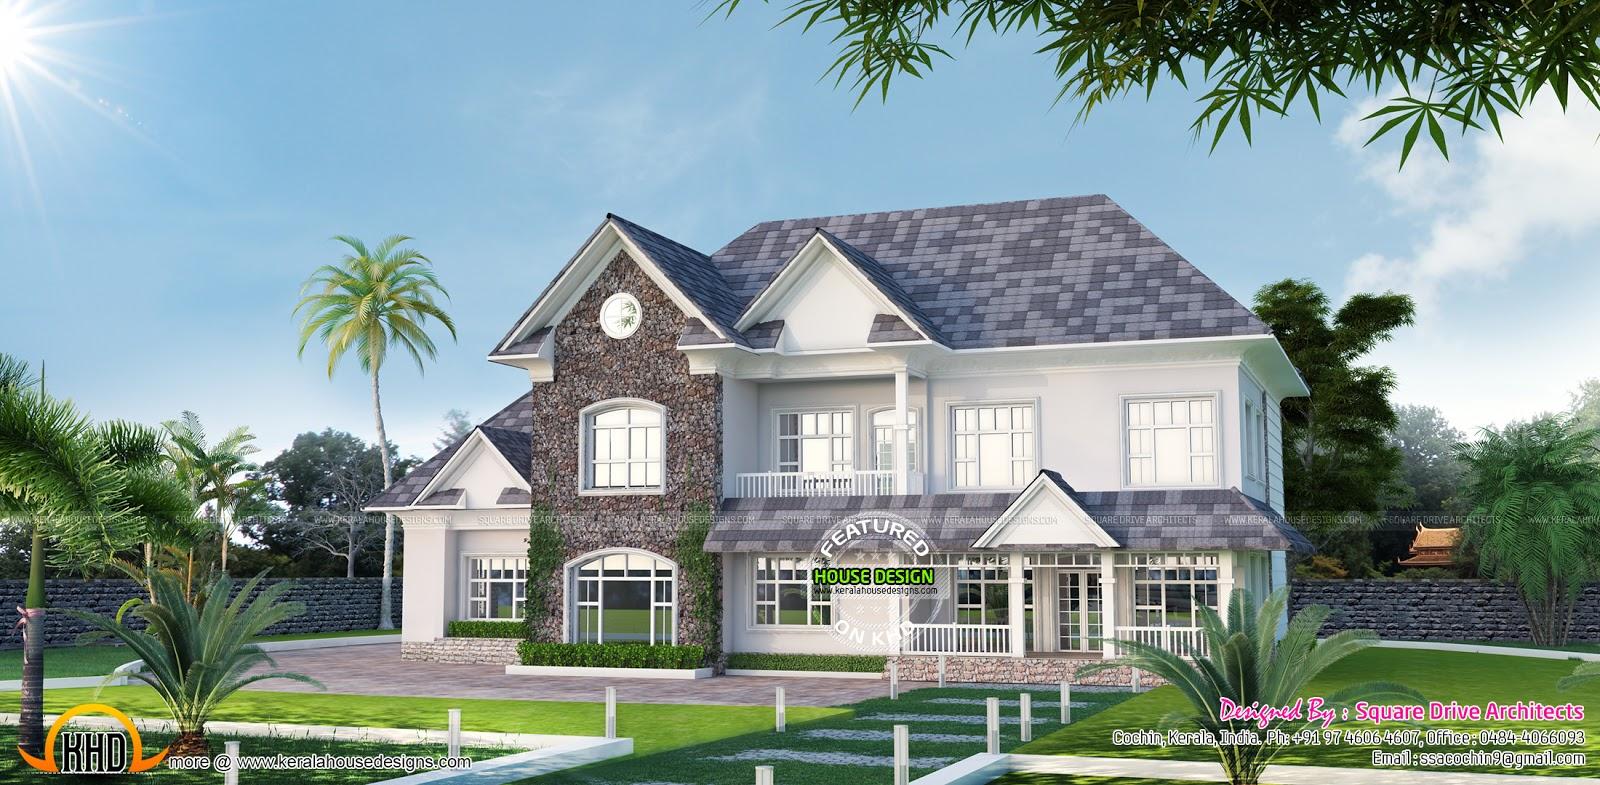 beautiful victorian style home design kerala home design victorian style home exterior trim victorian home exterior design